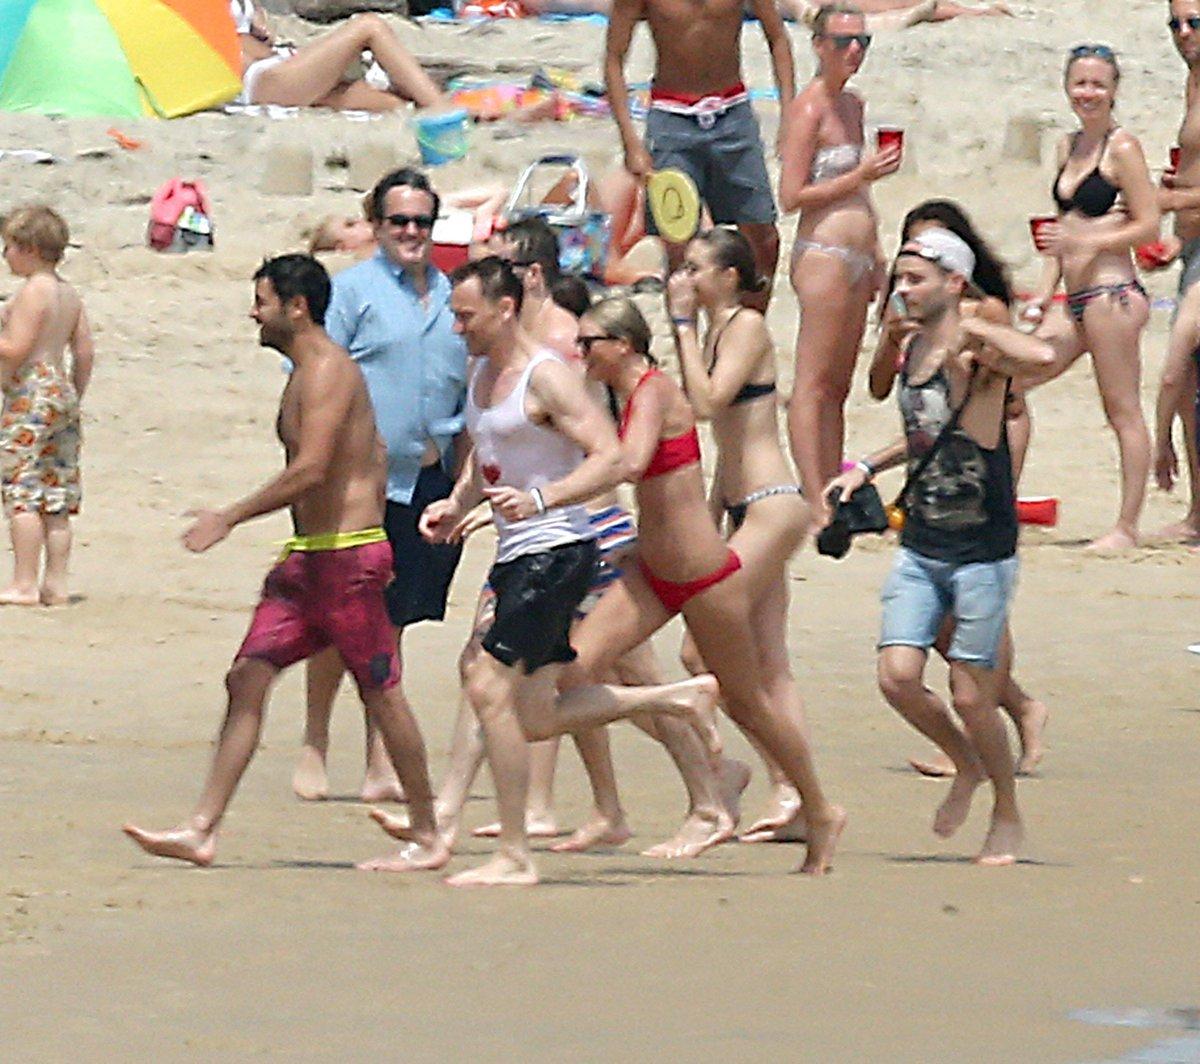 Gigi Hadid Source On Twitter July 3 Gigi Hadid Taylor Swift